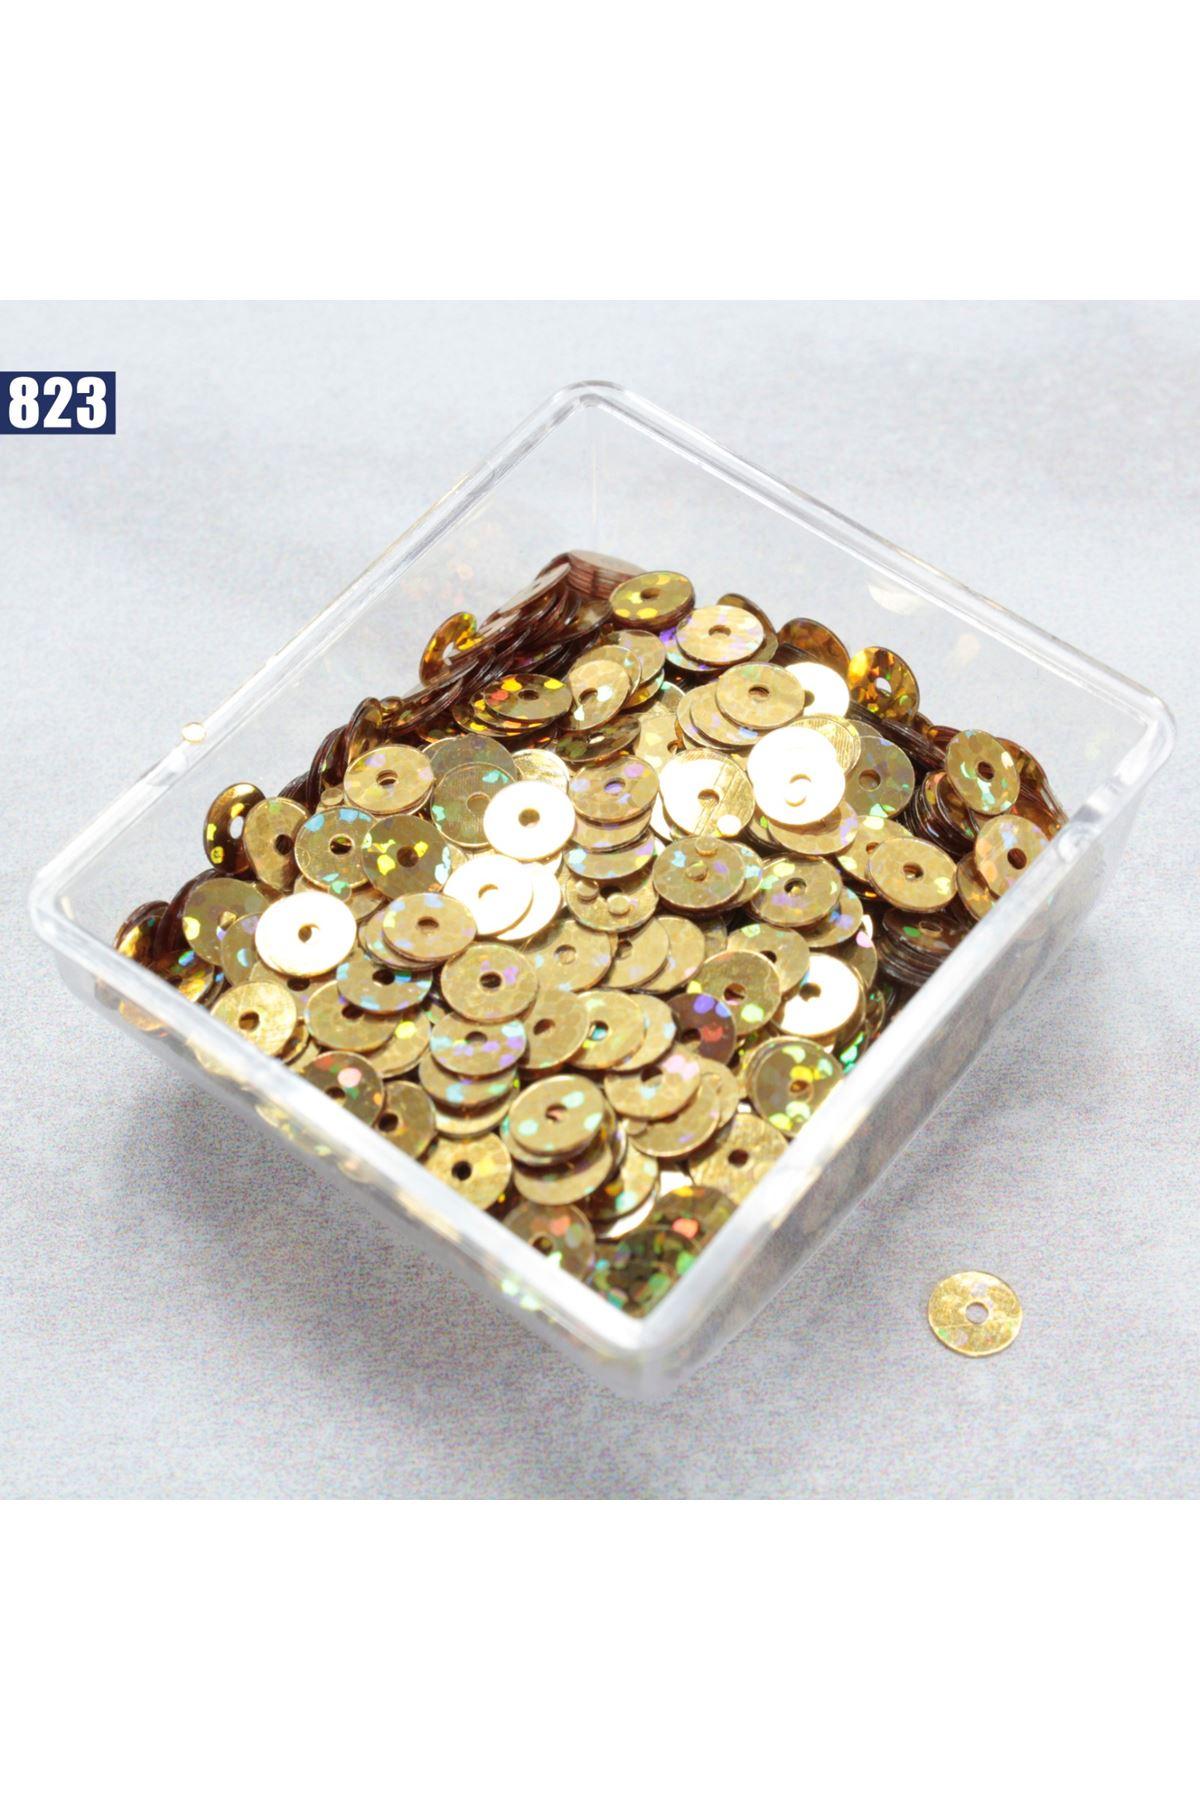 Pul 10 gram - 823